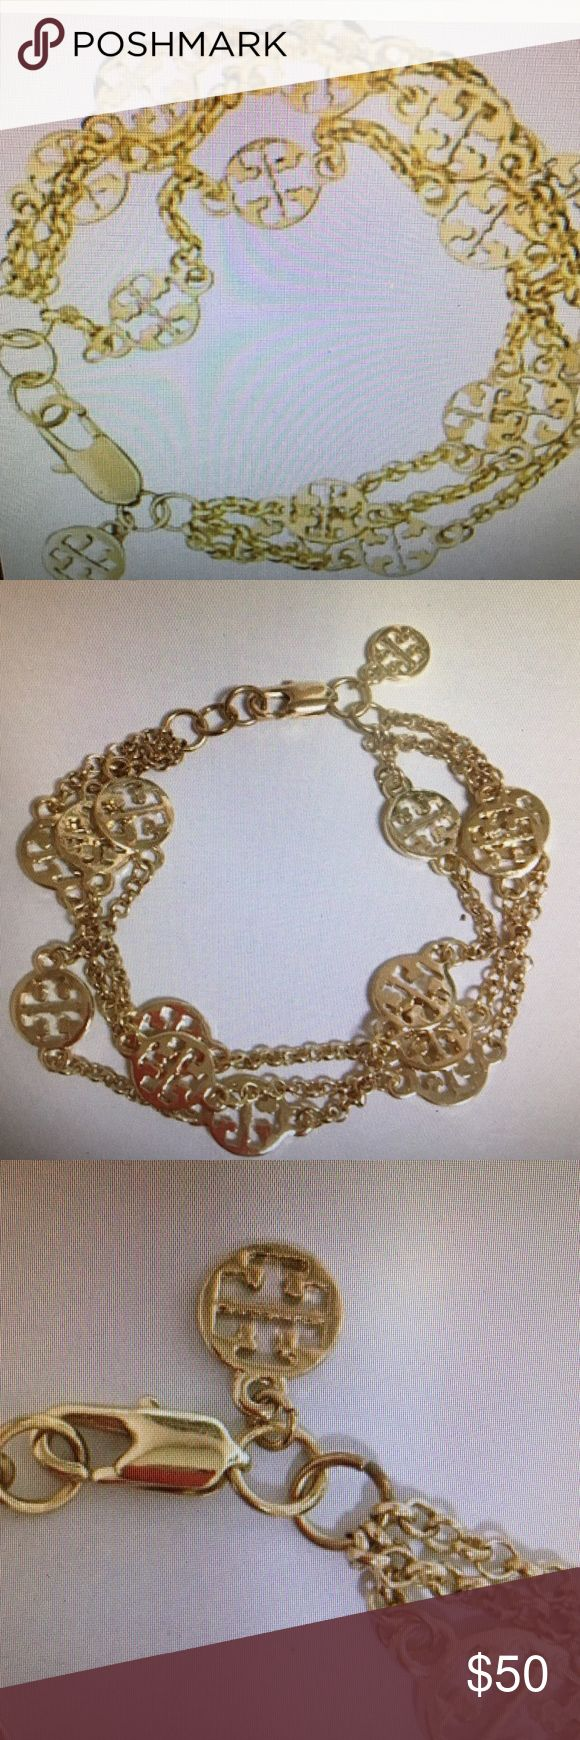 NWOT Tory Burch multi strand Logo bracelet Beautiful Tory Burch multi strand Logo Bracelet measures a little over 7 inches Tory Burch Jewelry Bracelets